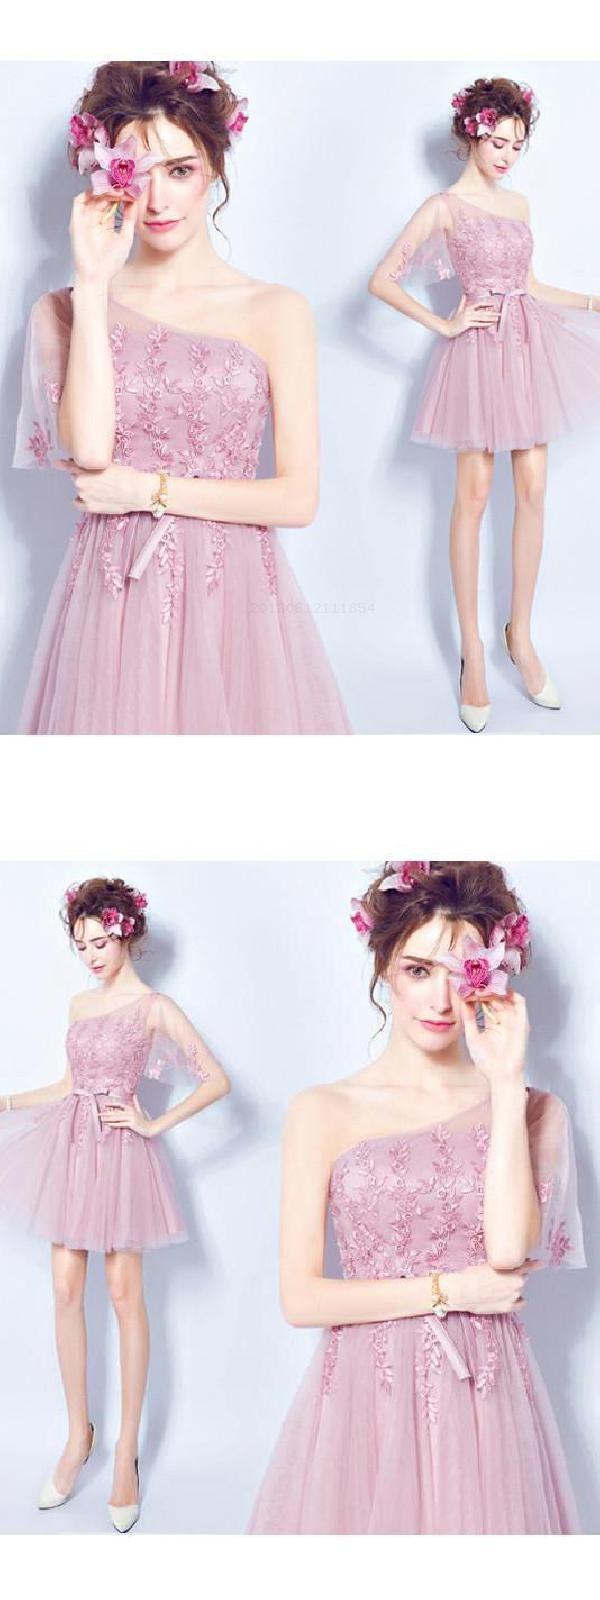 Discount substantial aline short homecoming dresses